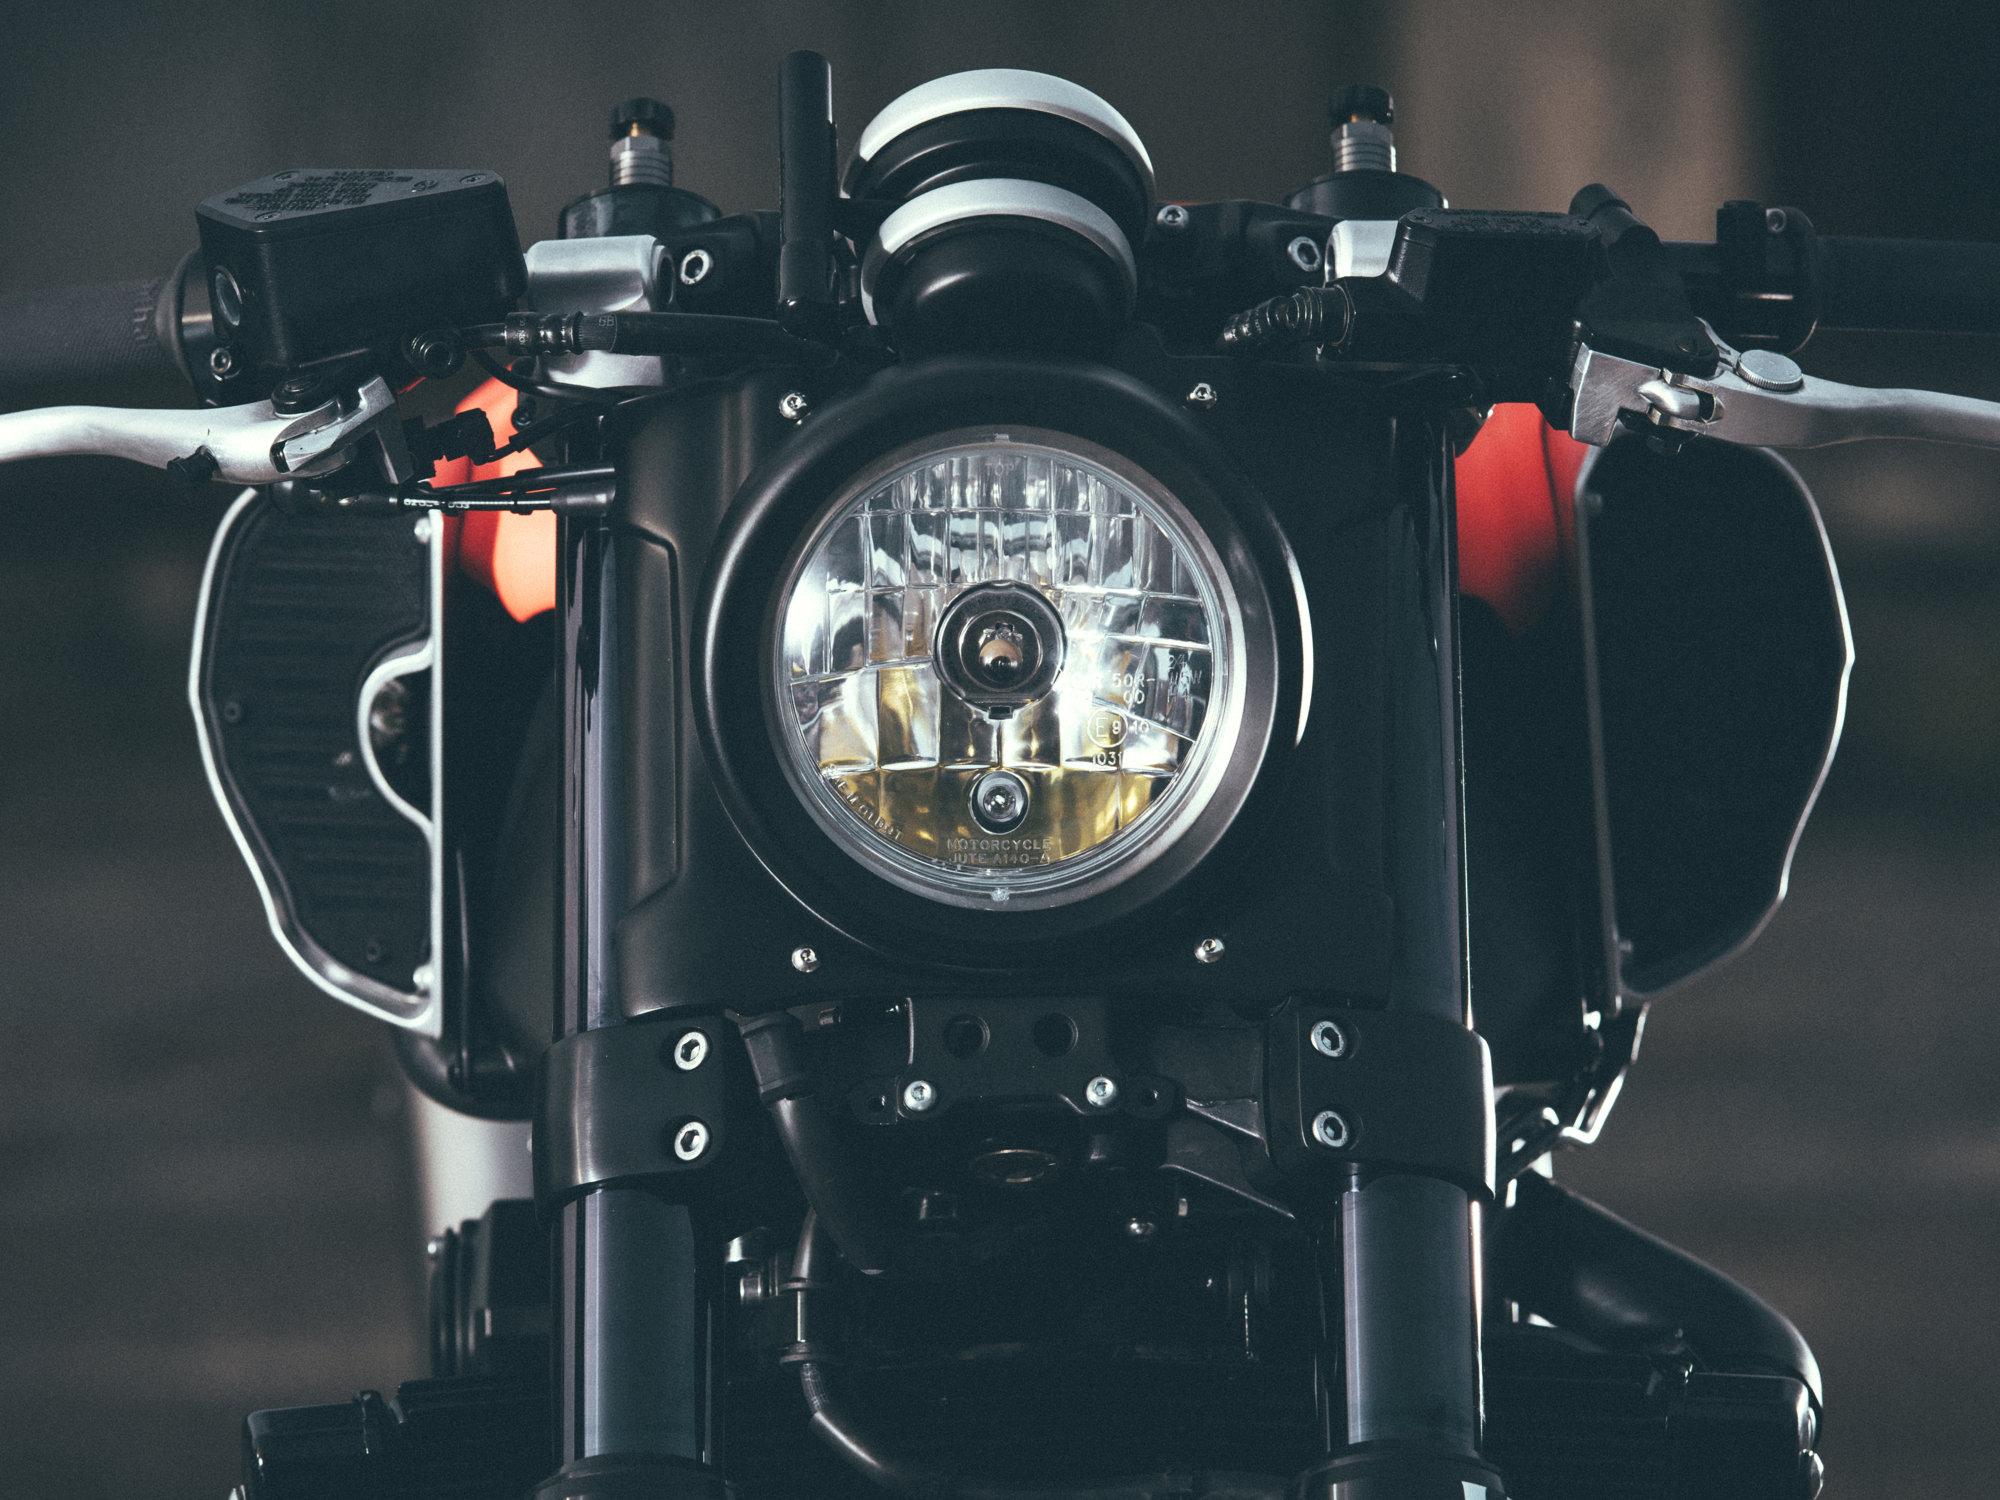 Custom Yamaha Vmax Infrared Yard Built By Jvb Moto Rescogs